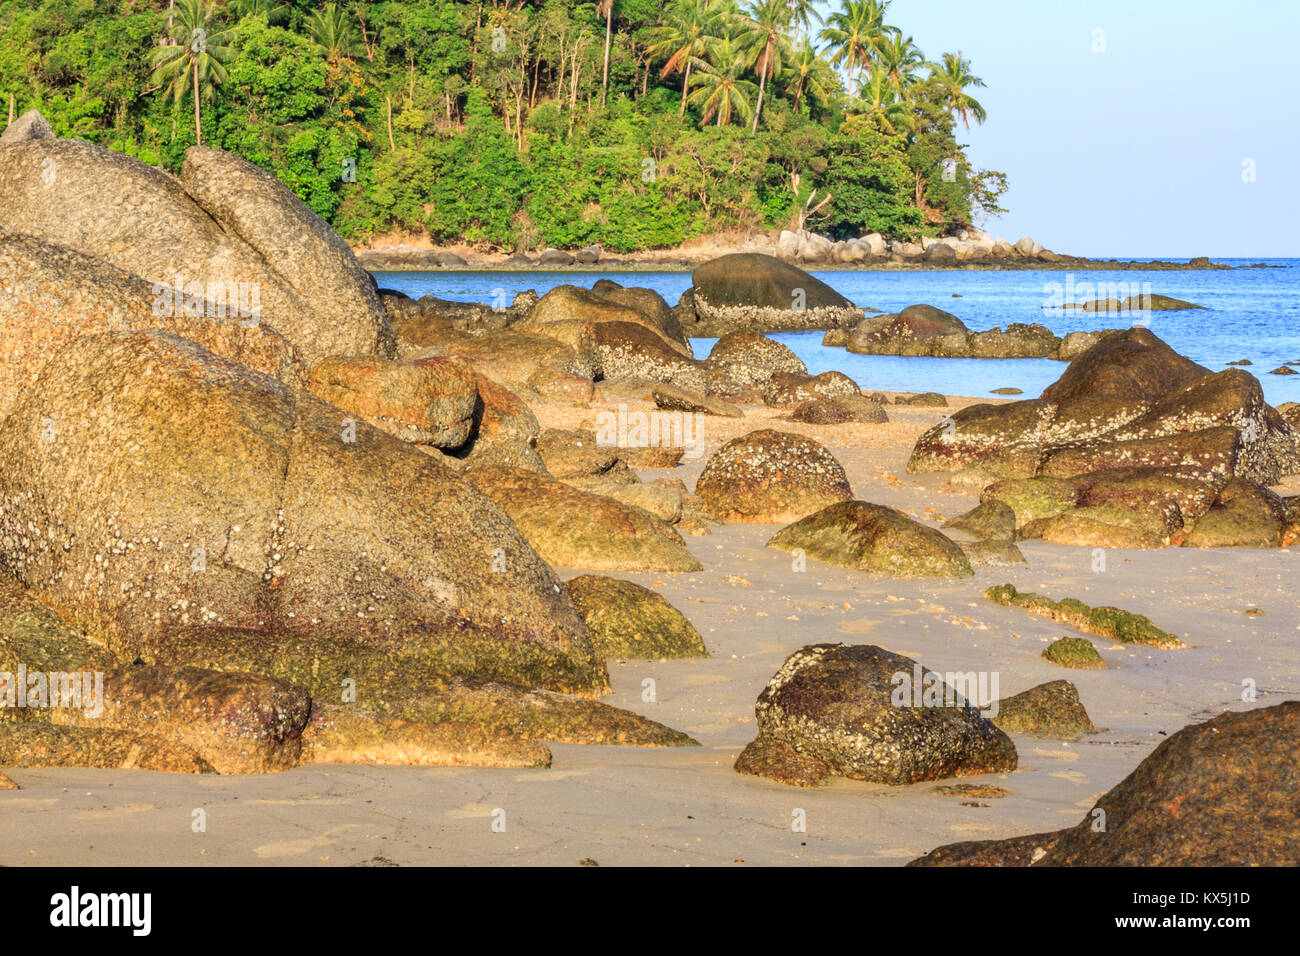 Rocks on tropical beach, Bang Tao, Phuket, Thailand - Stock Image